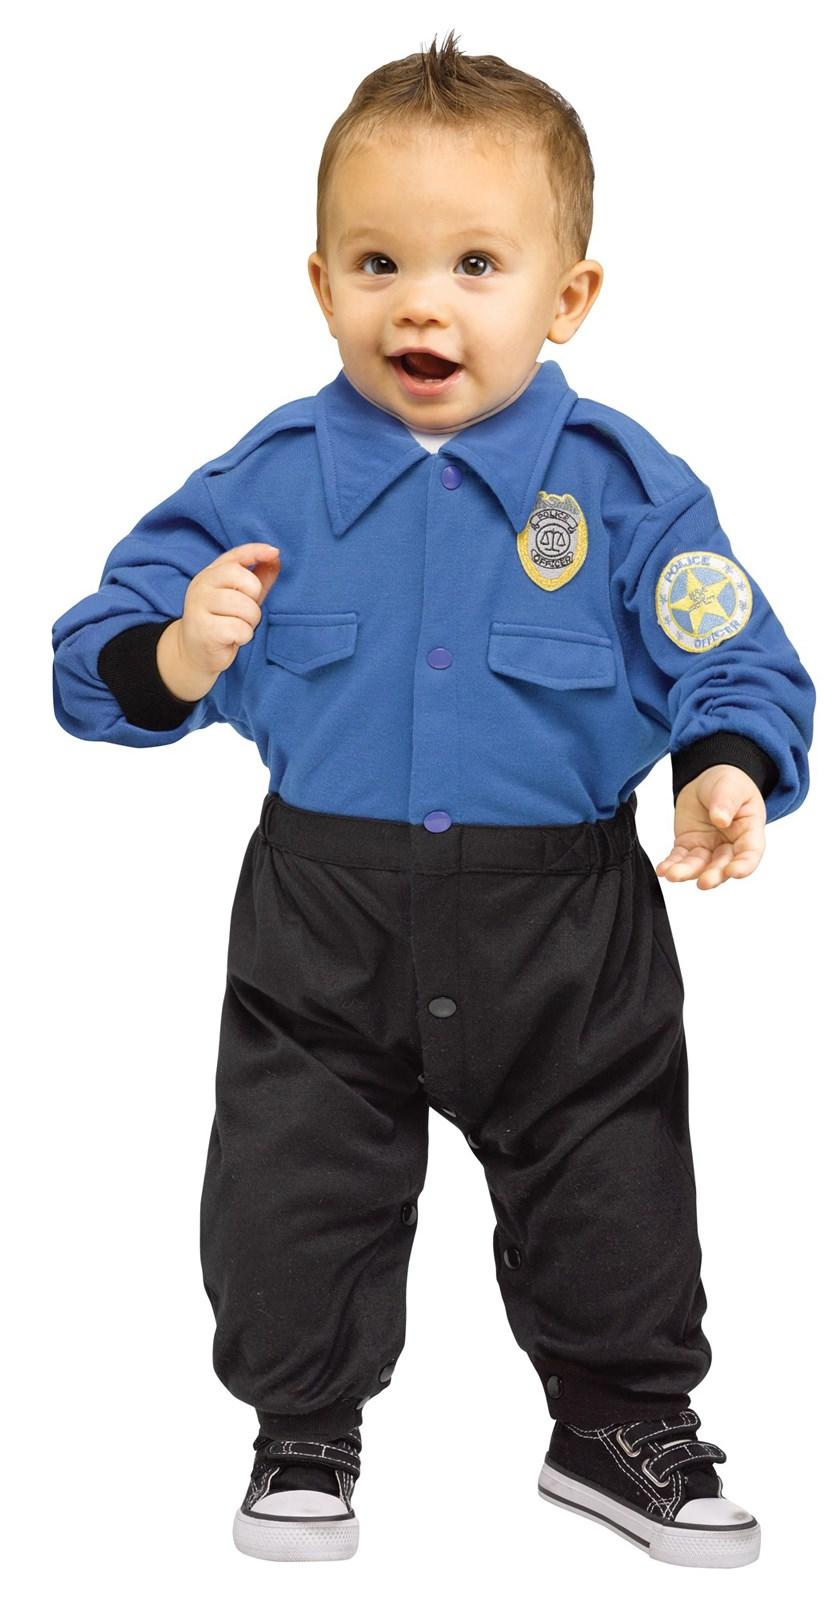 Toddler Policeman Costume | BuyCostumes.com